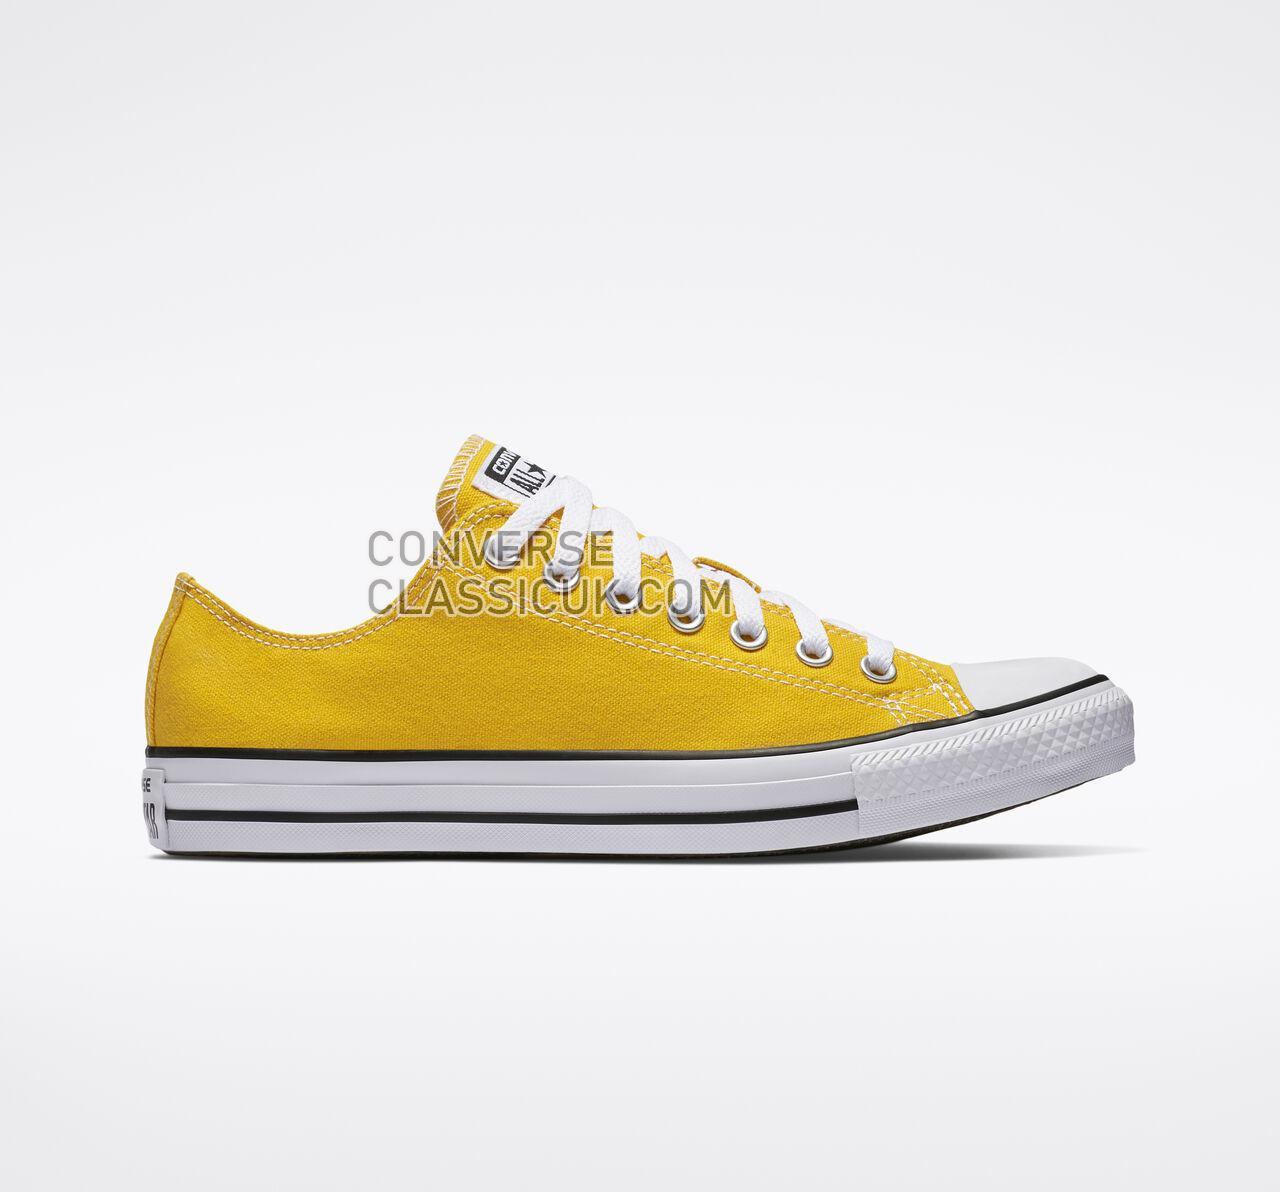 Converse Chuck Taylor All Star Low Top Mens Womens Unisex 130129F Lemon Chrome Shoes